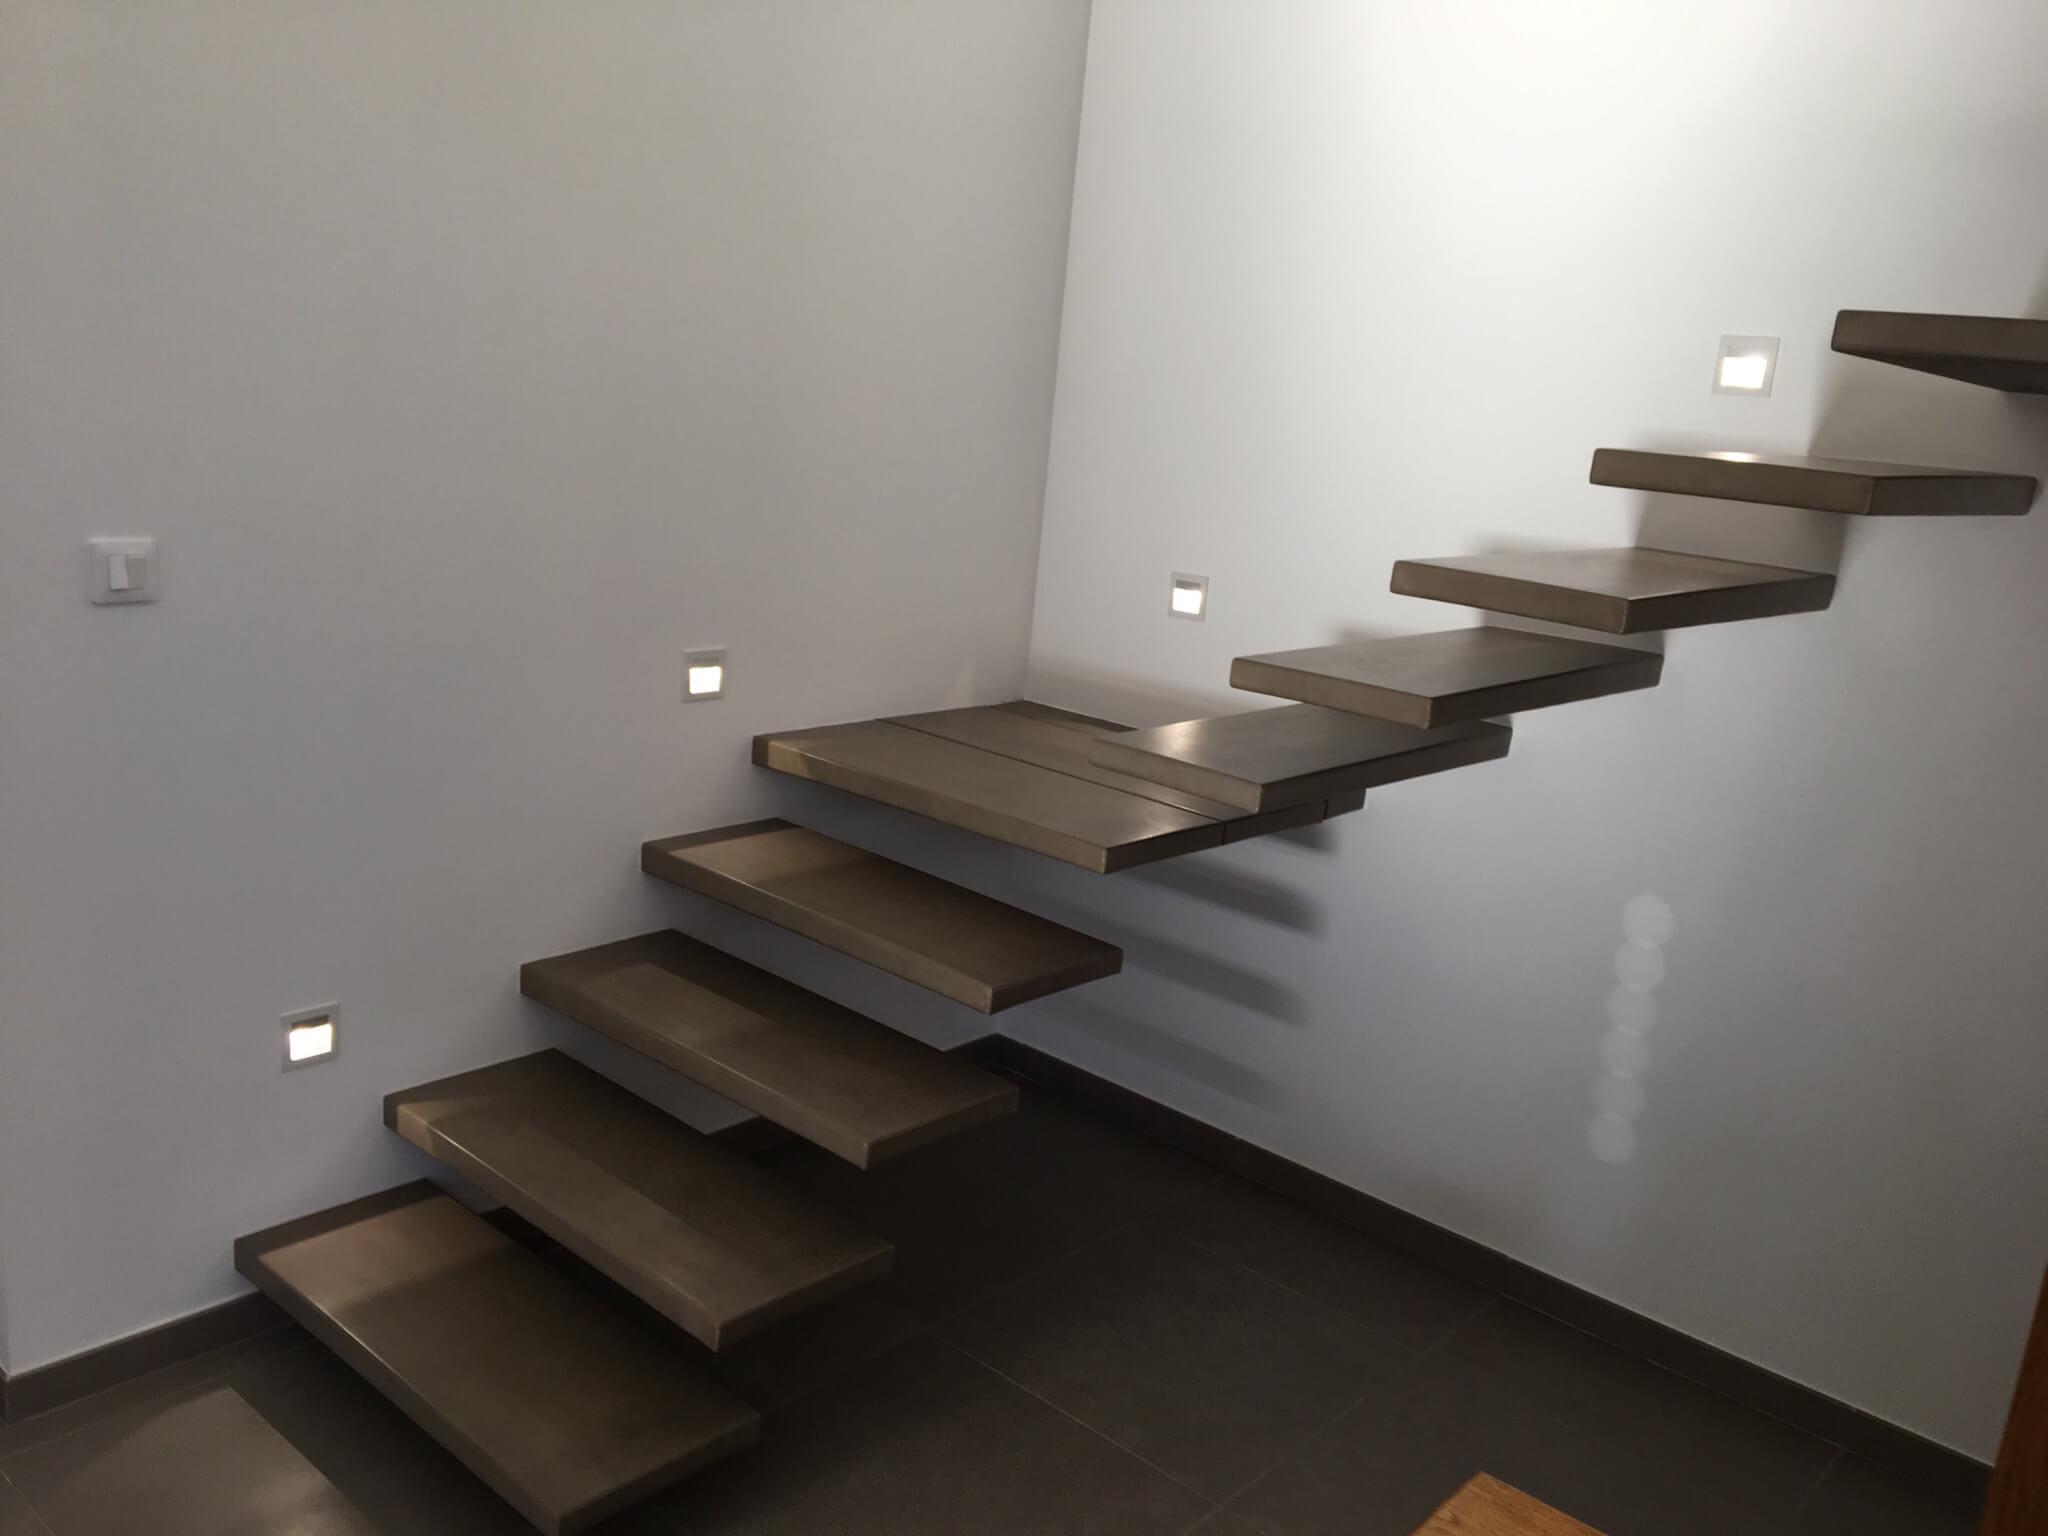 Escalier suspendu avec Angle Annonay